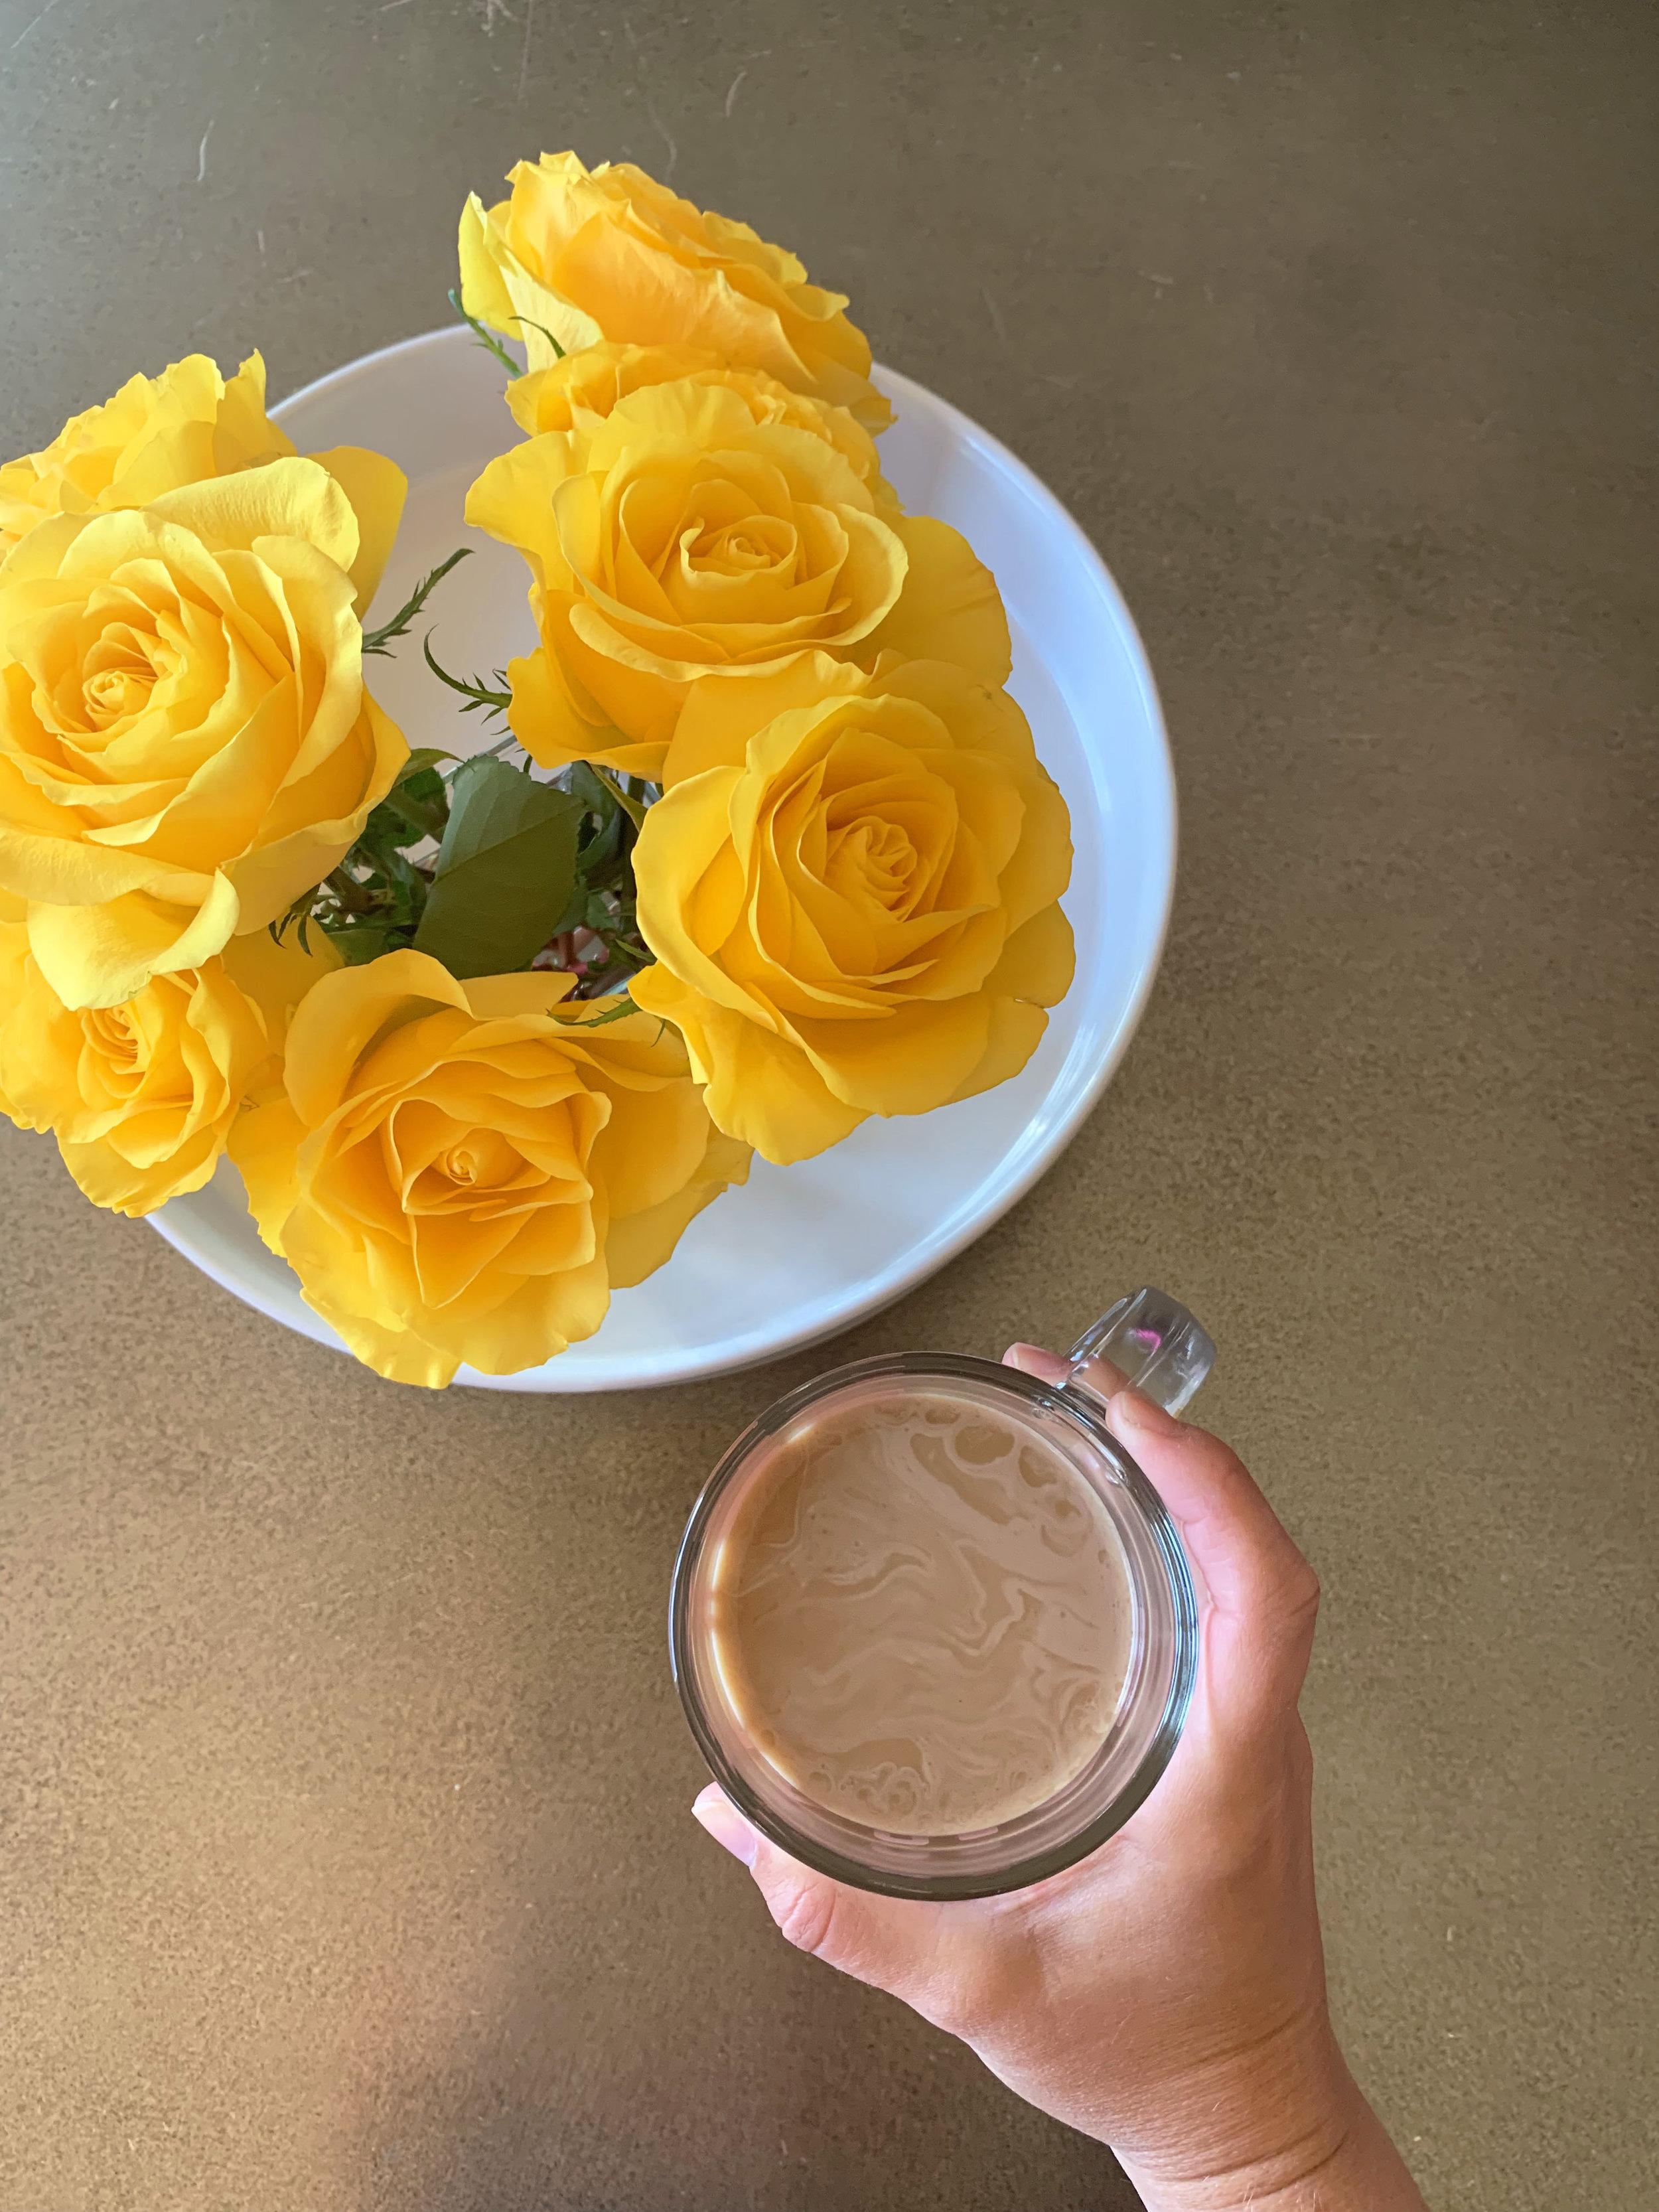 2019 08 23 Coffee 01.jpg